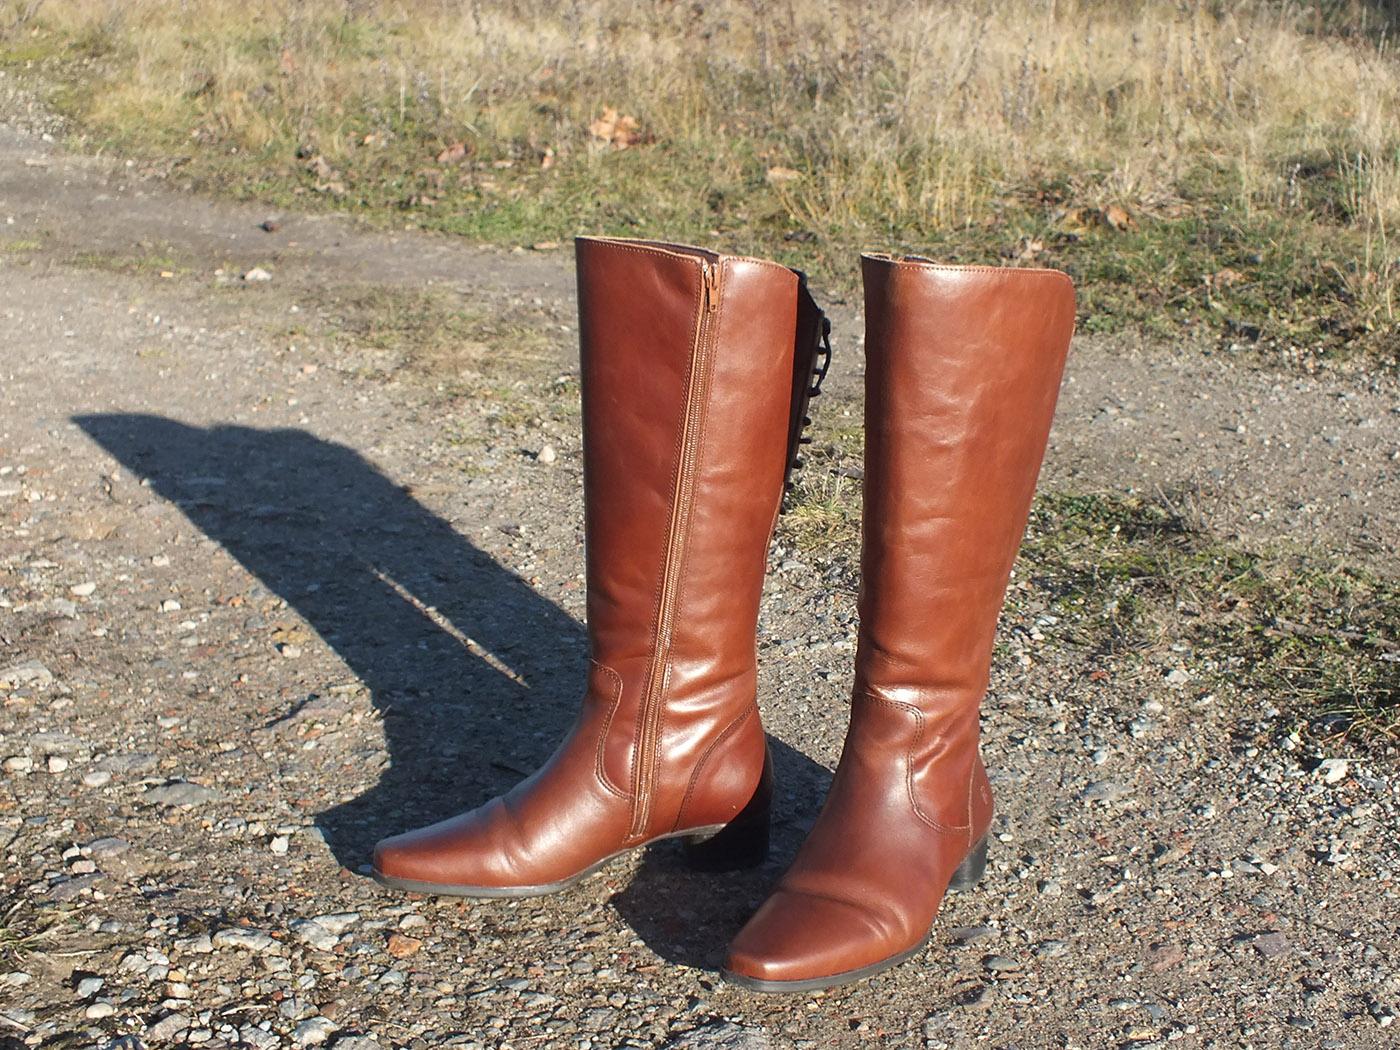 lipoedem fashion wide shaft boots big legs calves xxl shaft_web